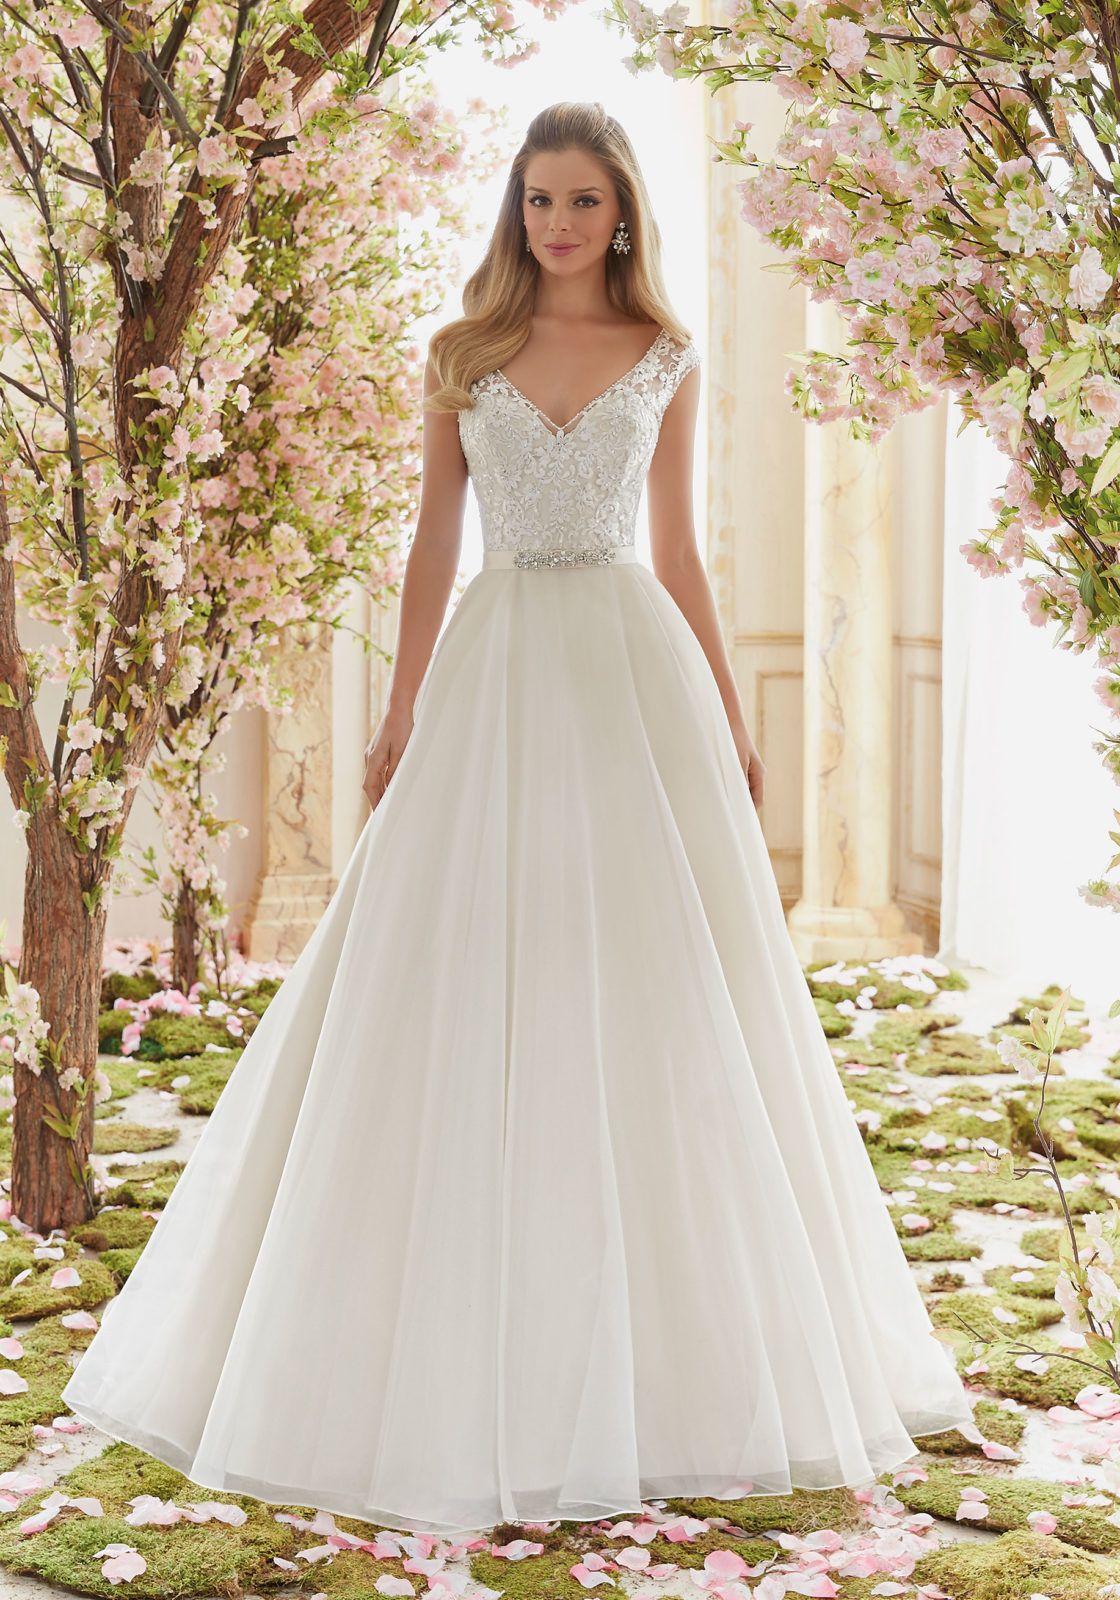 Mori Lee, 6836, White, Sz 20 Available at Debra\'s Bridal ...